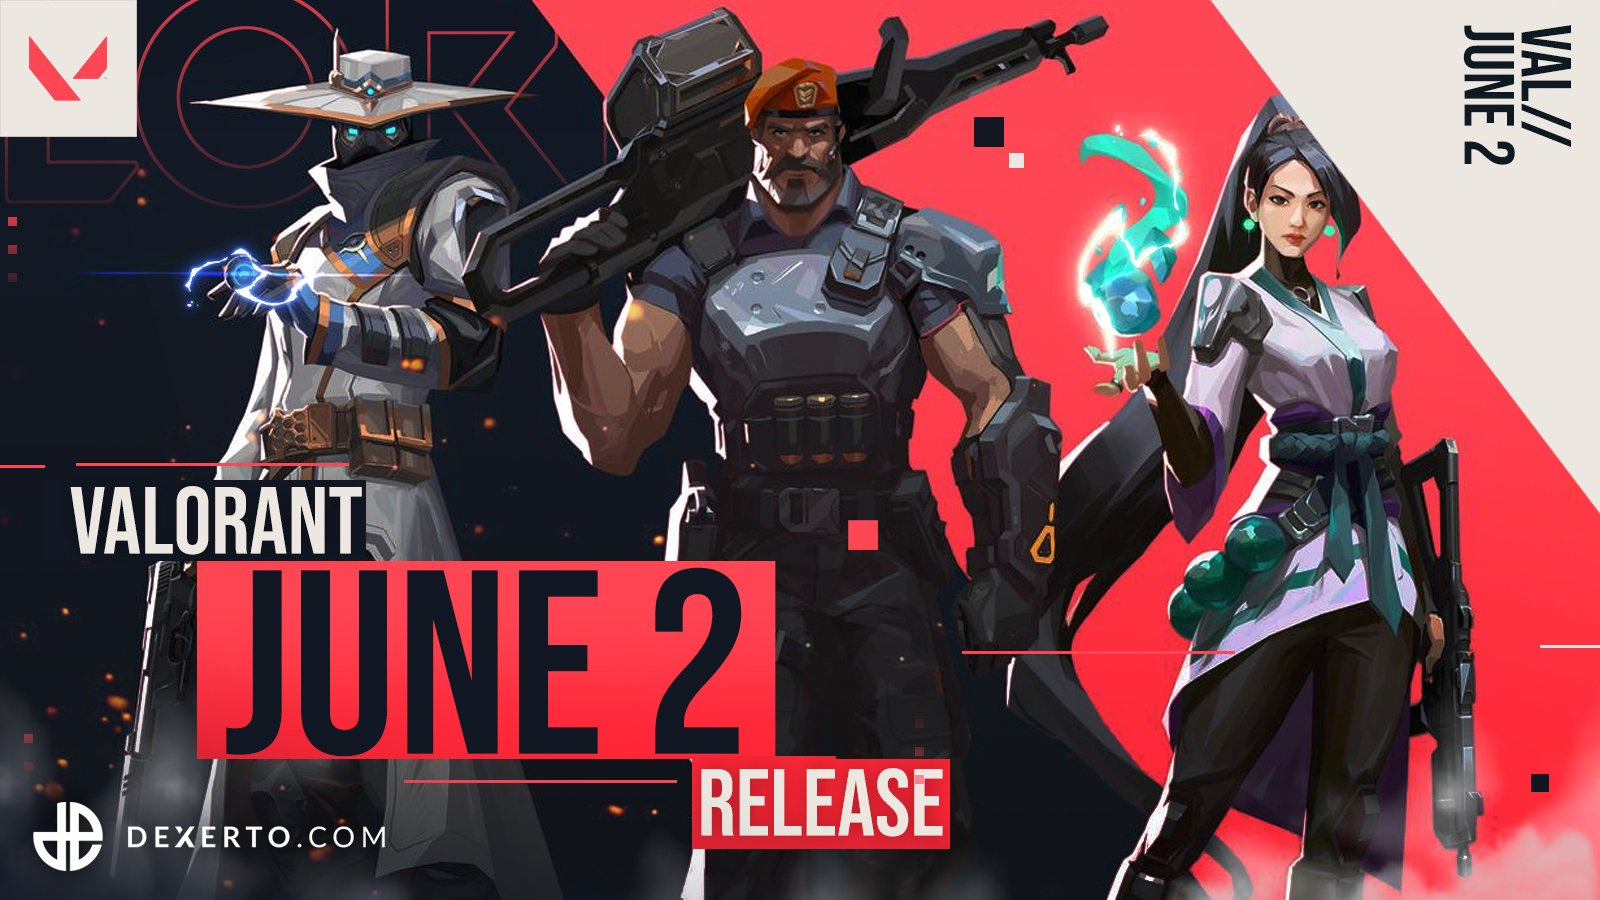 《VALORANT》宣布将于6月2日正式上线